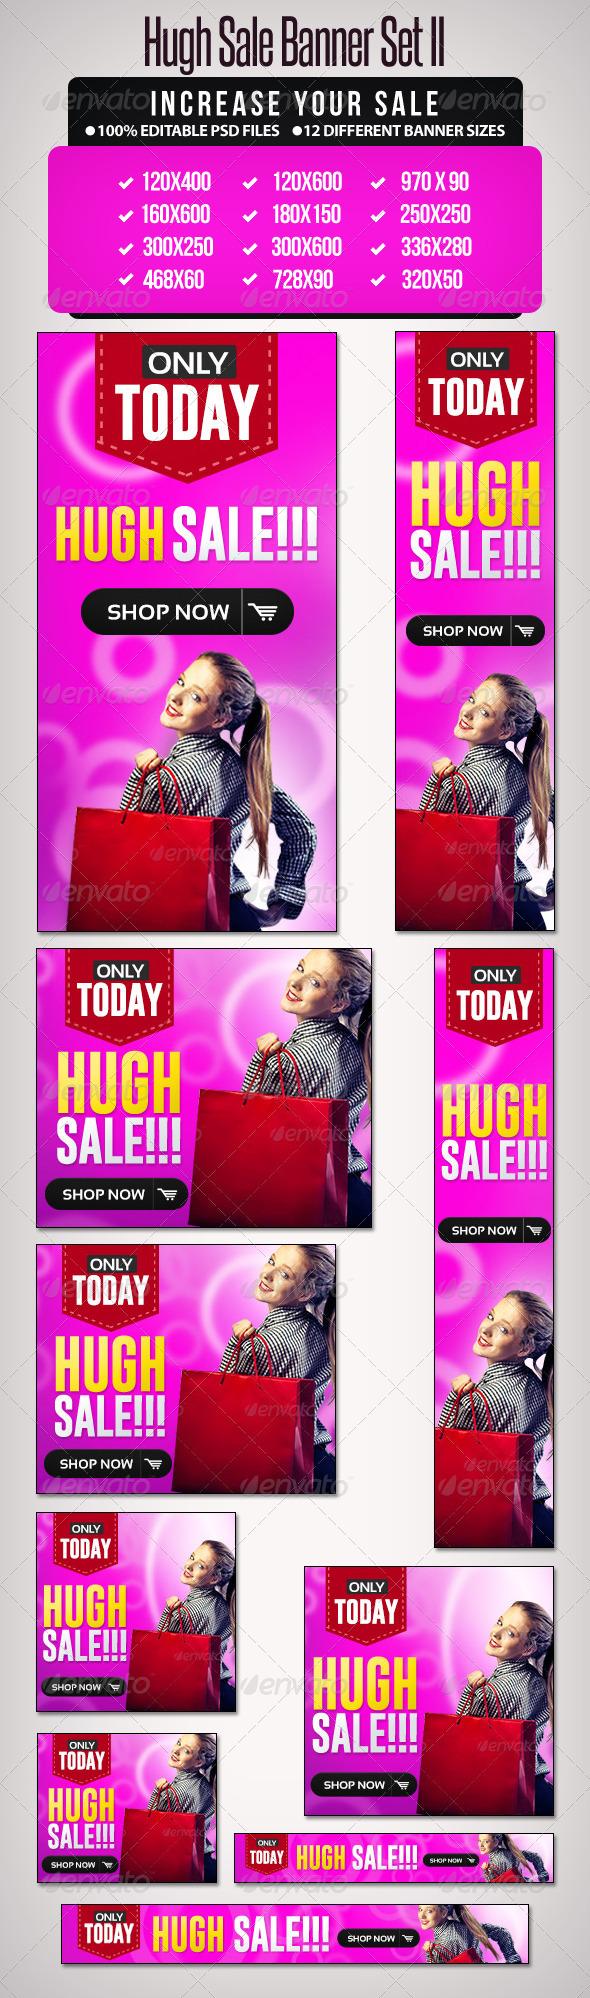 GraphicRiver Hugh Sale Banner Set 2 6238471